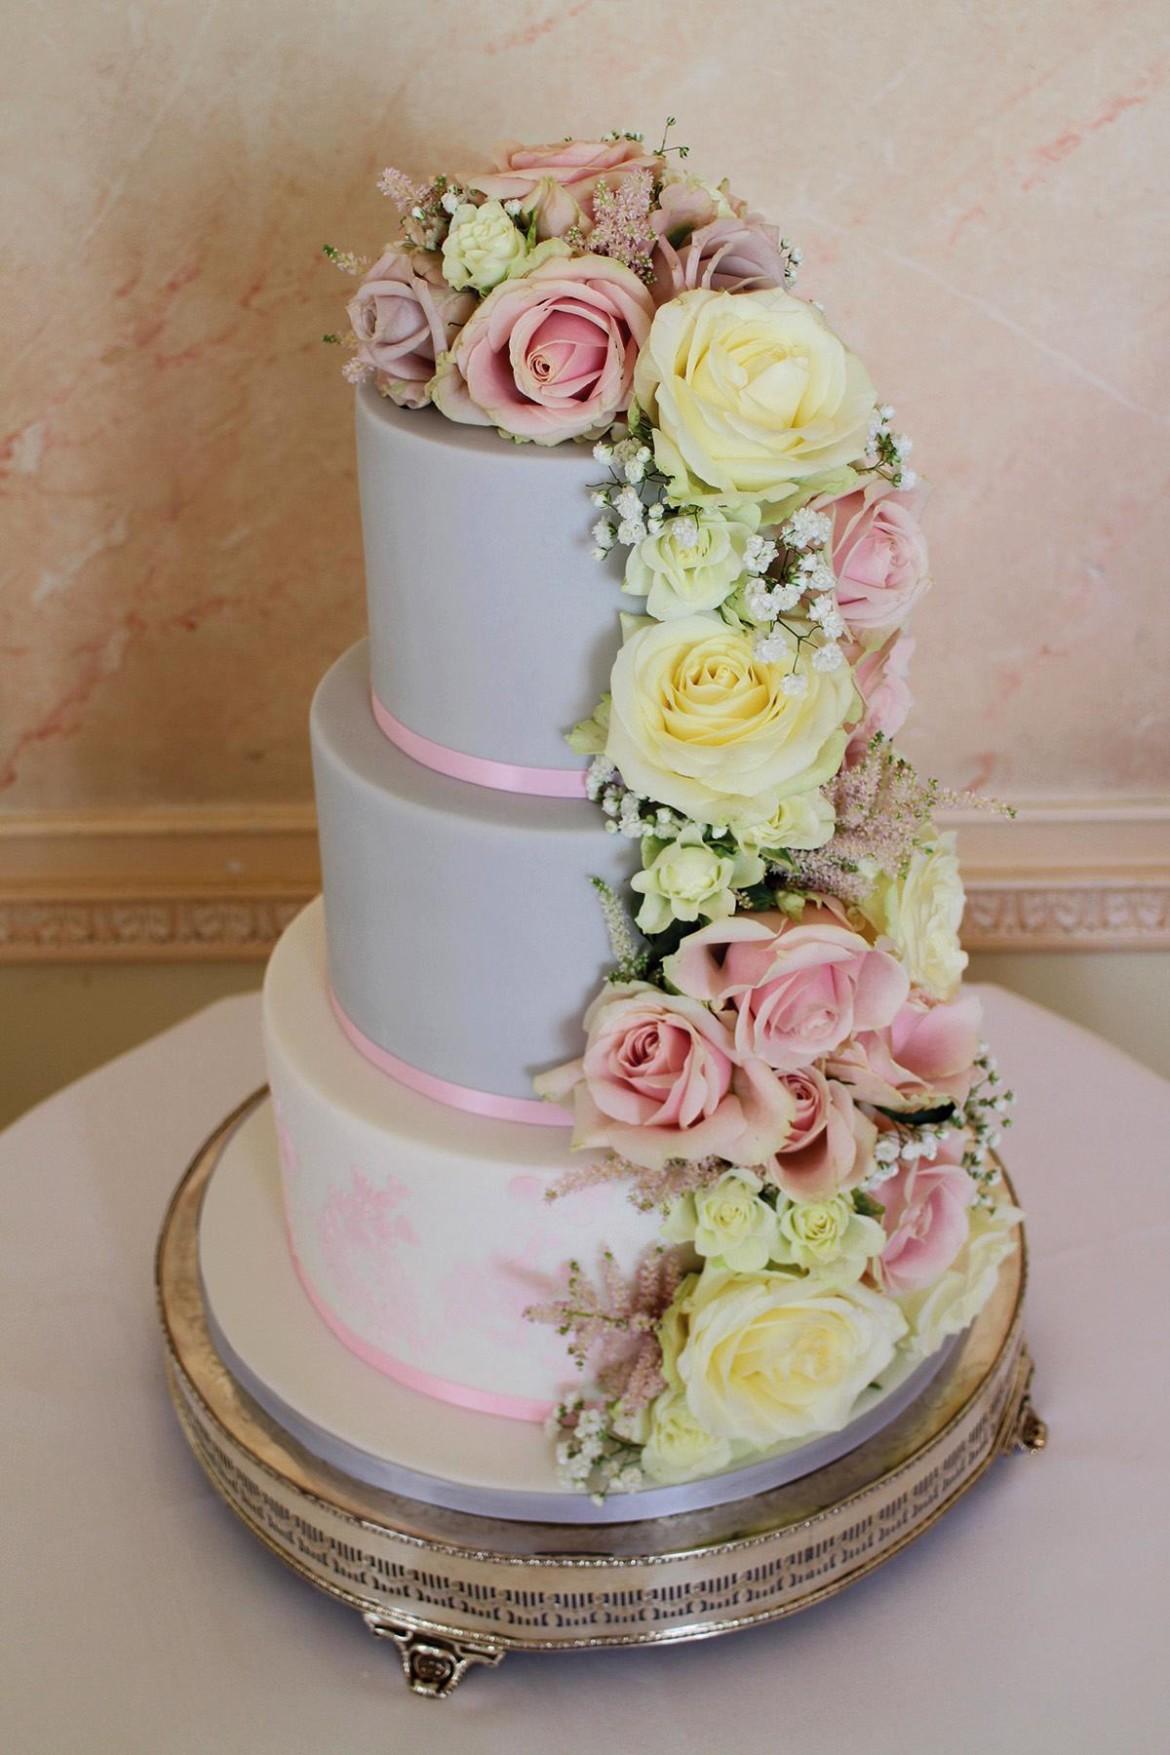 Win your wedding cake!